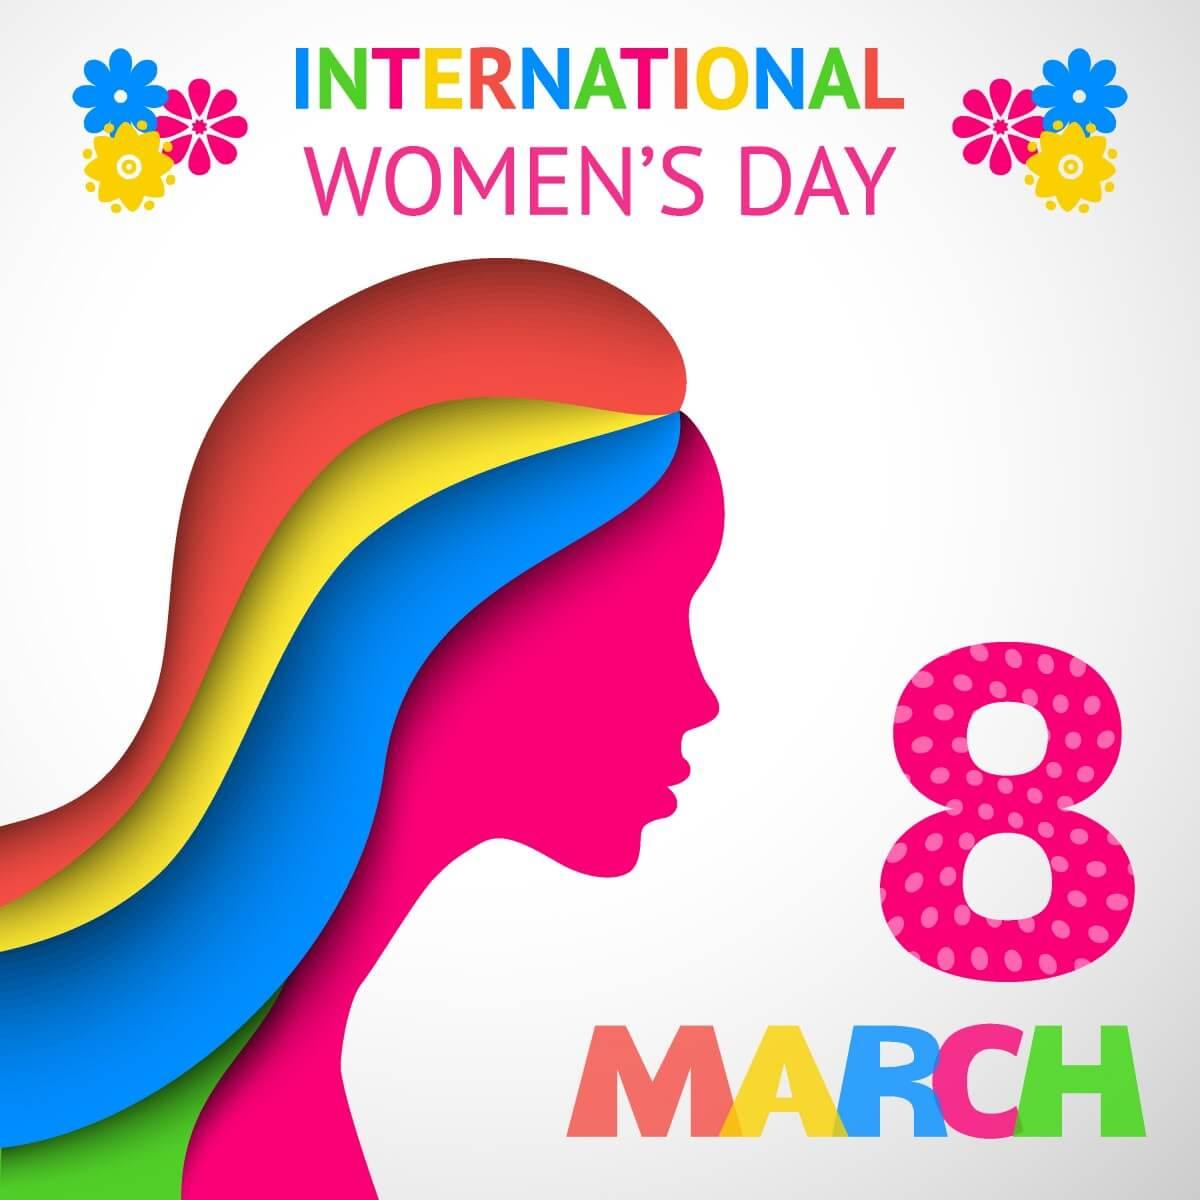 International Womens Day 8th March Wallpaper